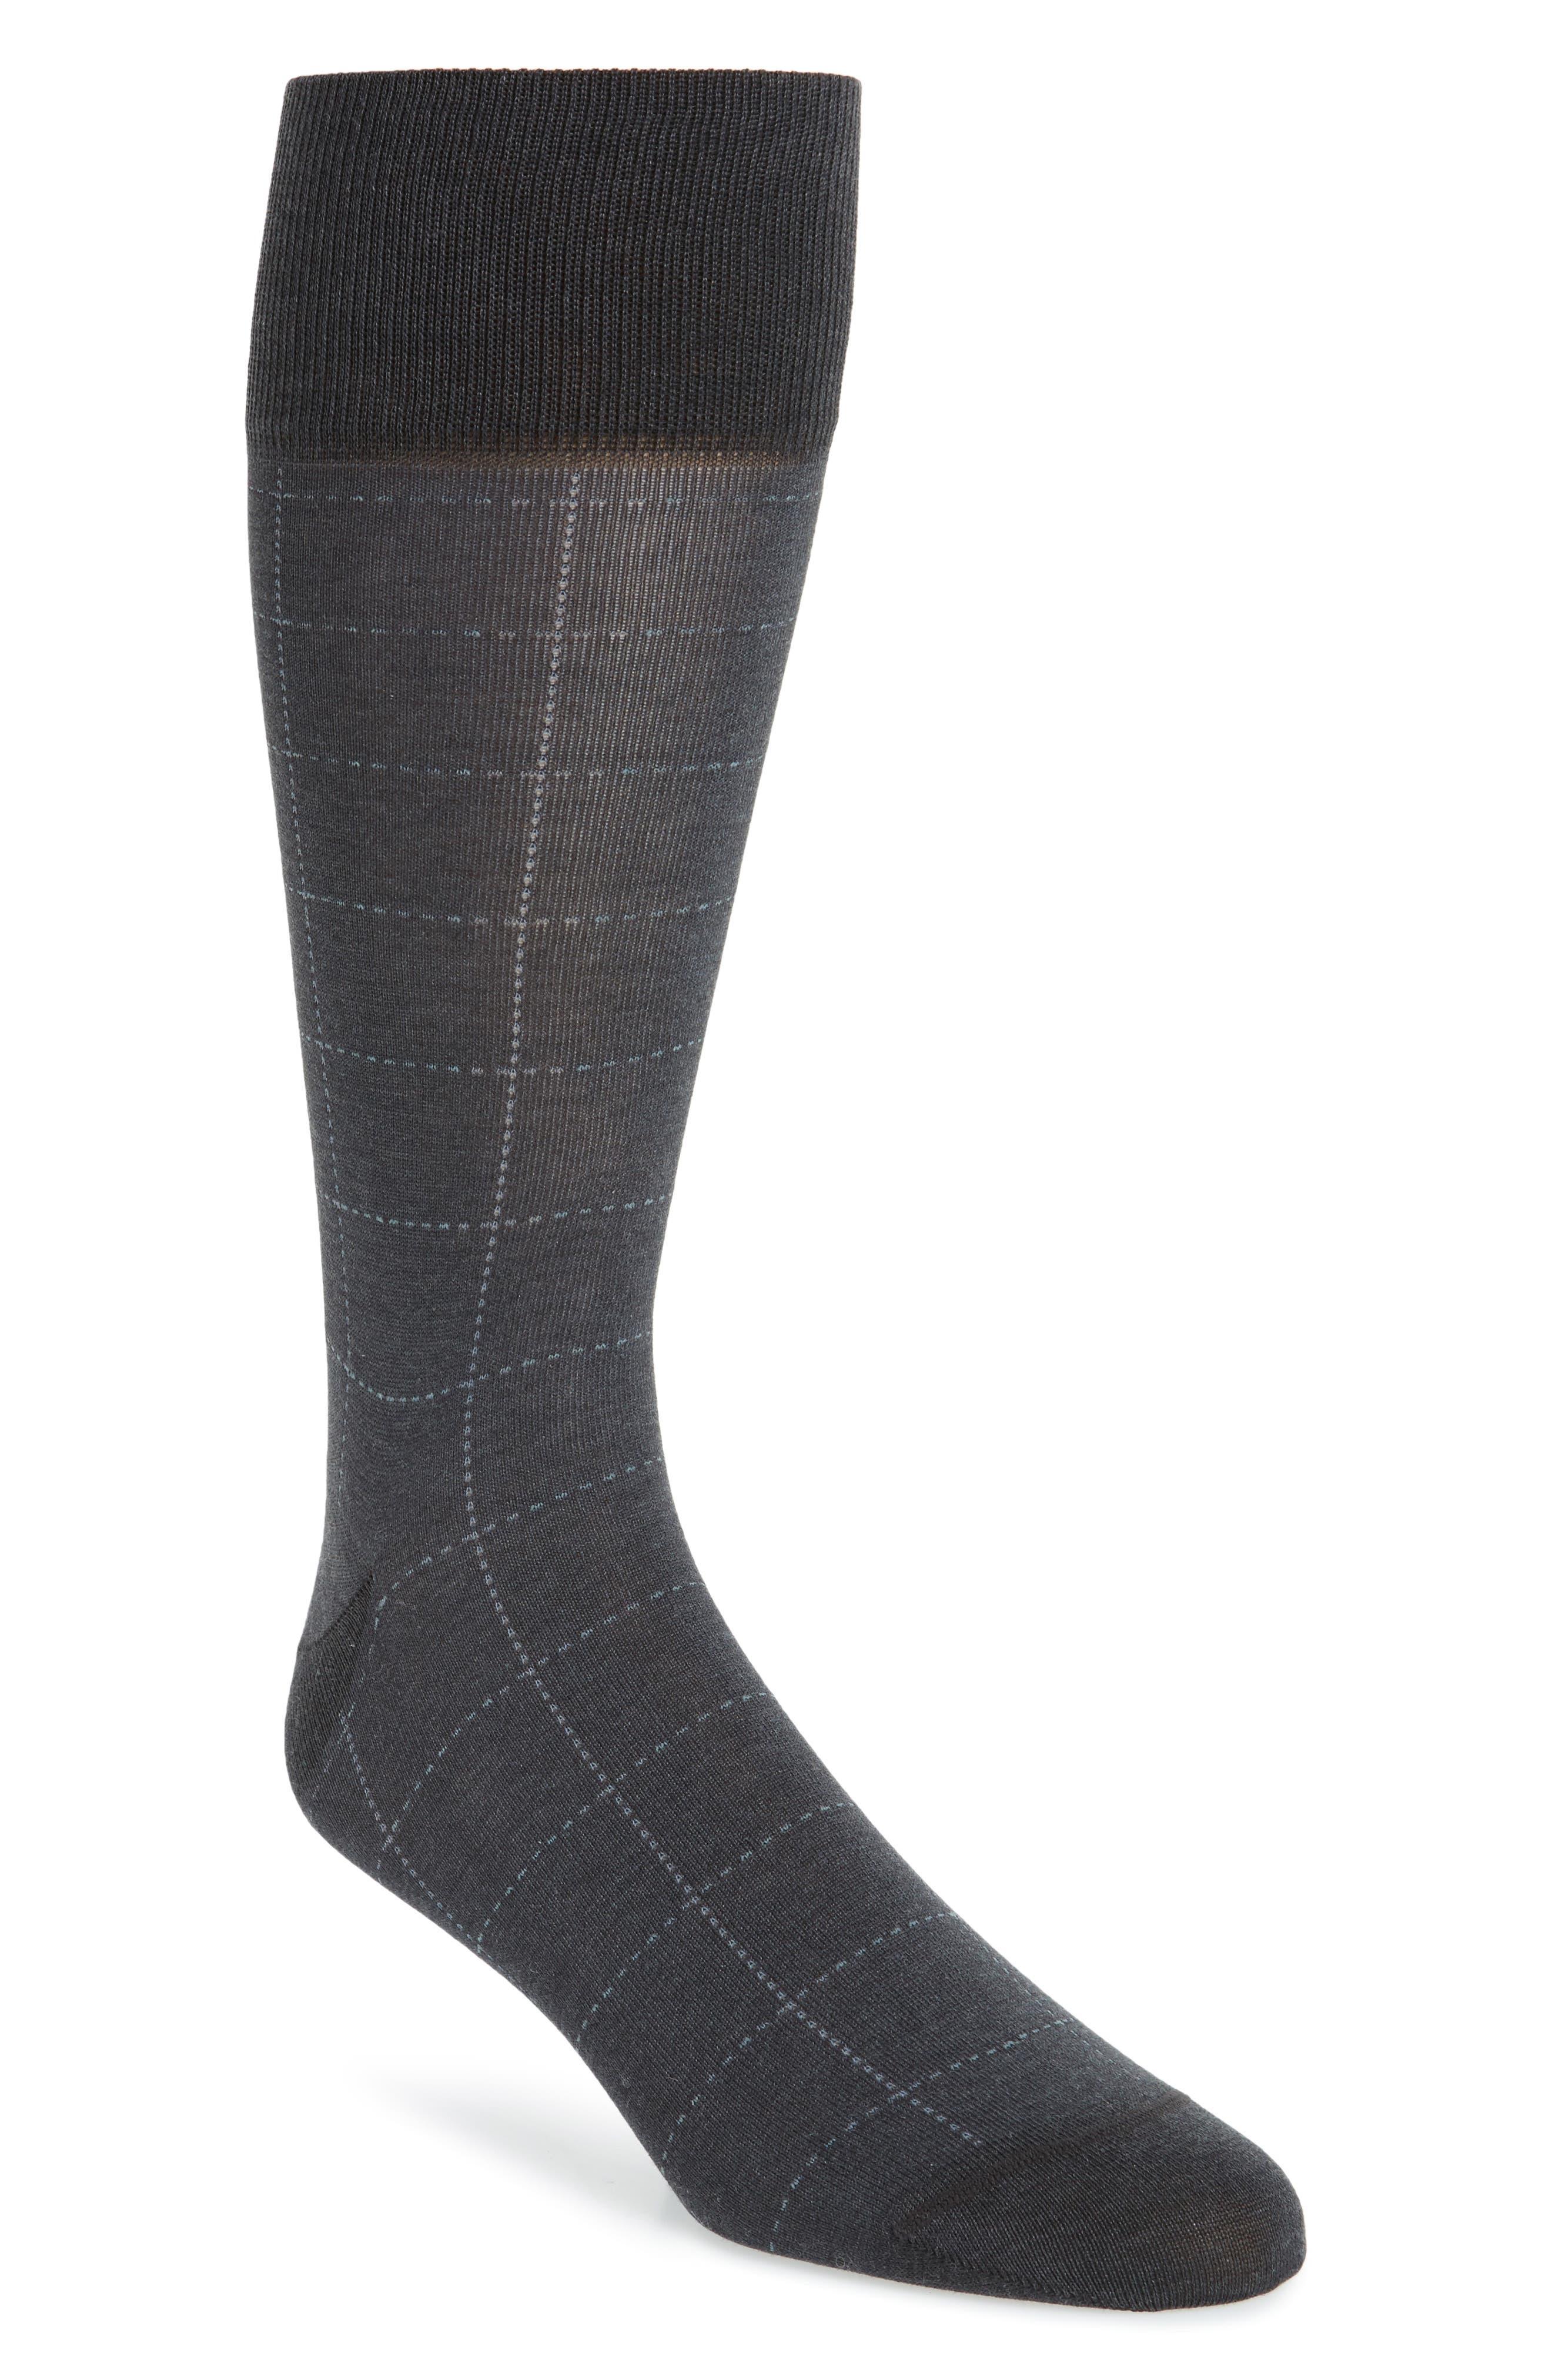 Broken Grid Socks,                             Main thumbnail 1, color,                             Charcoal Heather